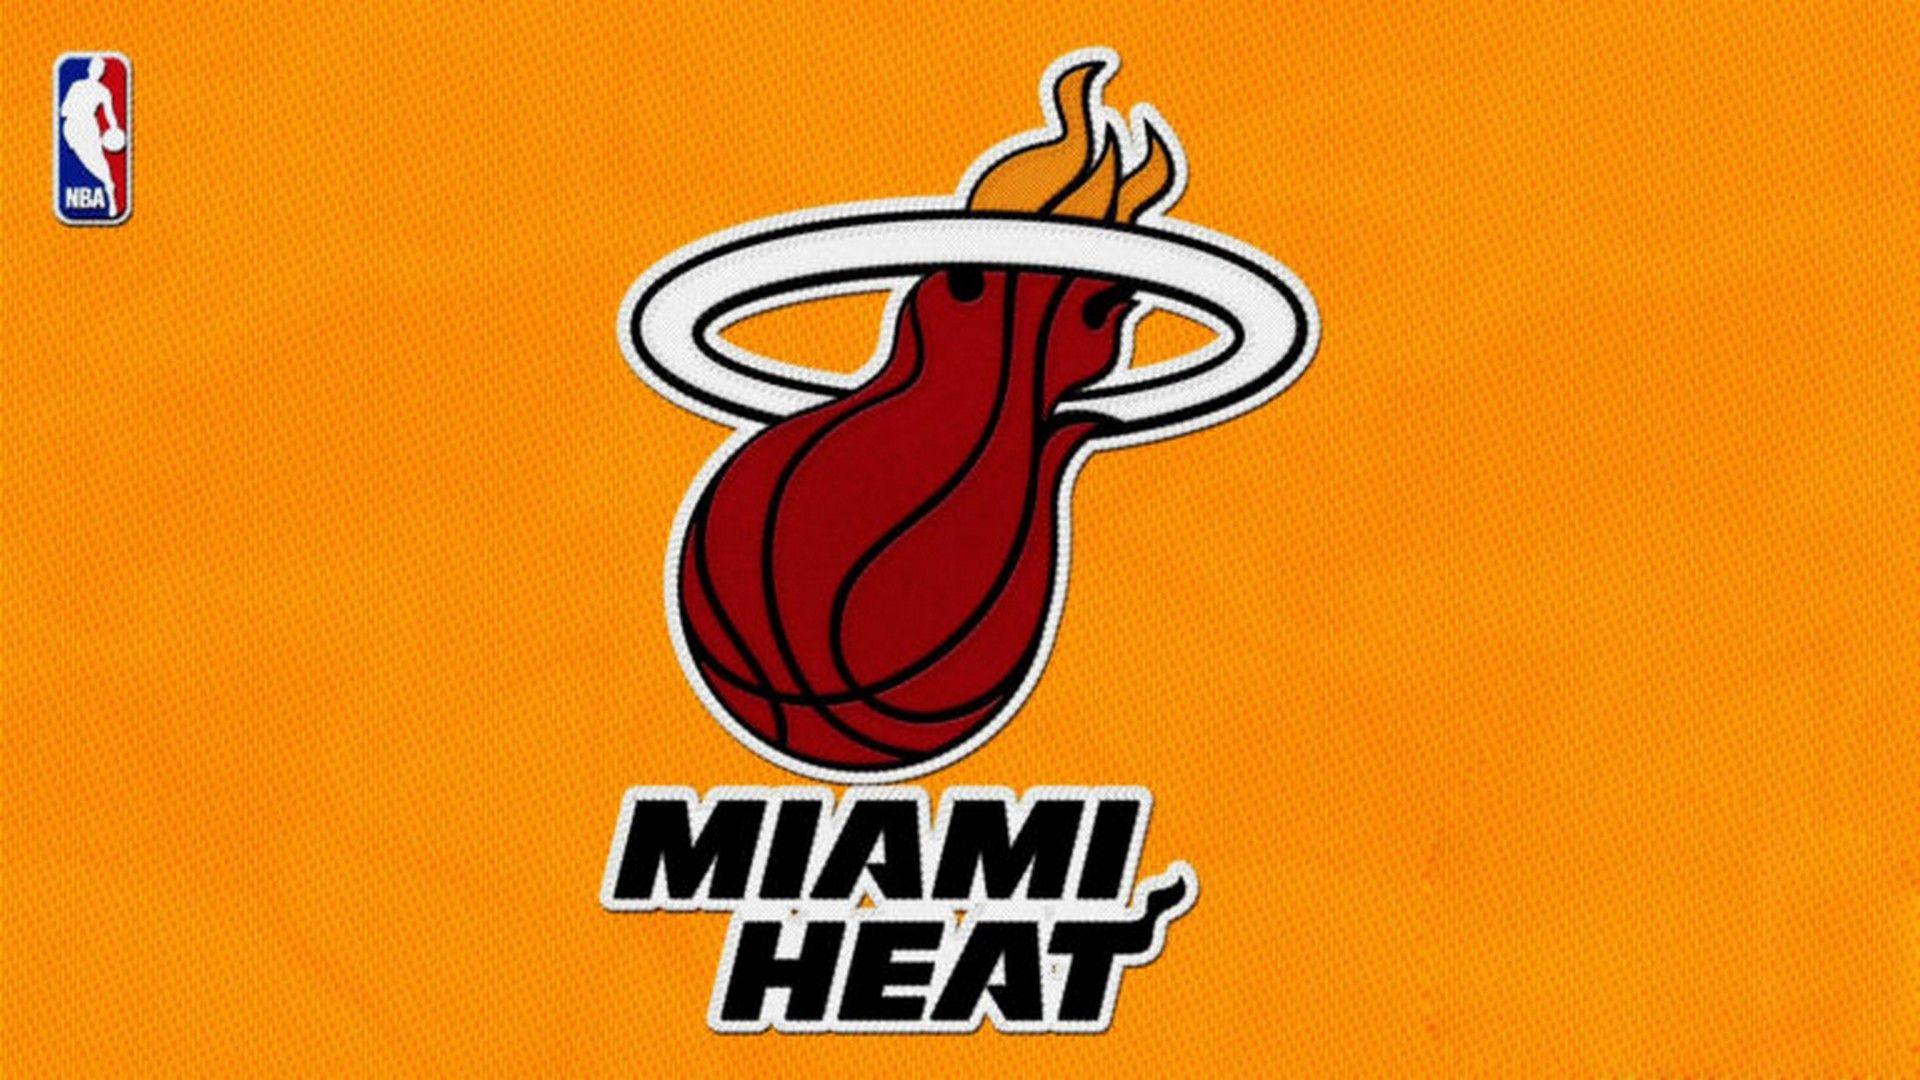 Basketball Wallpaper Best Basketball Wallpapers 2020 Miami Heat Miami Heat Logo Miami